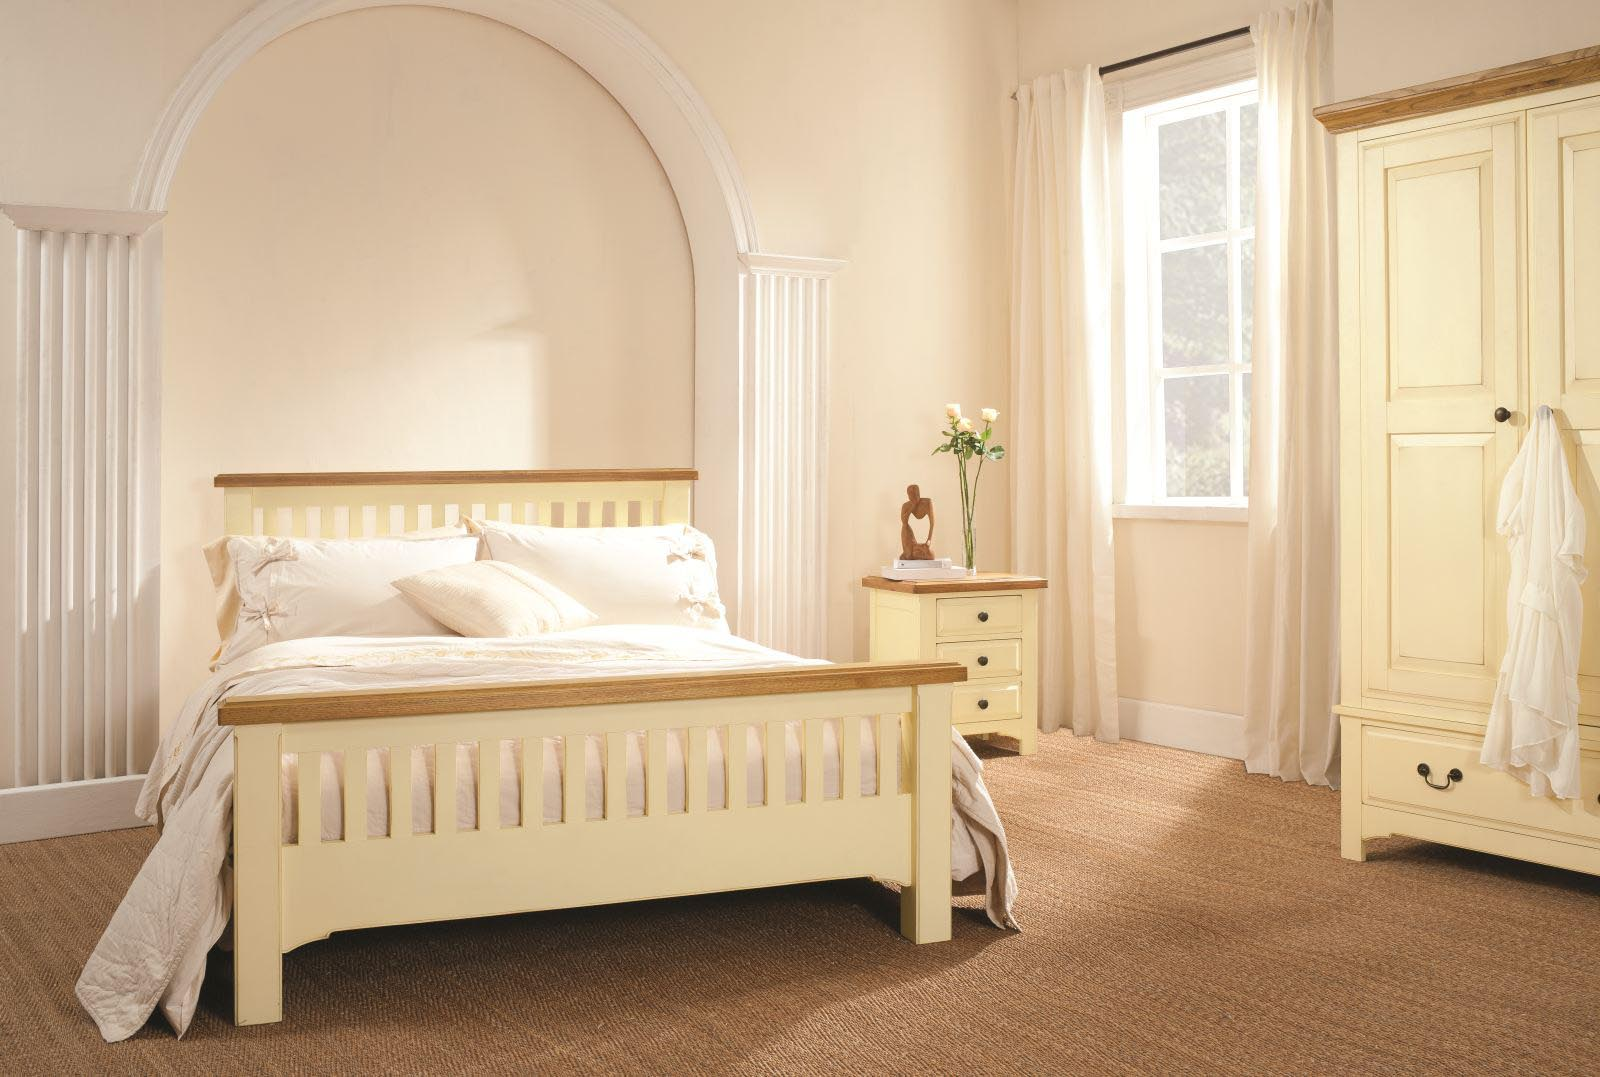 Pine Painted Bedroom Furniture  Best Decor Things